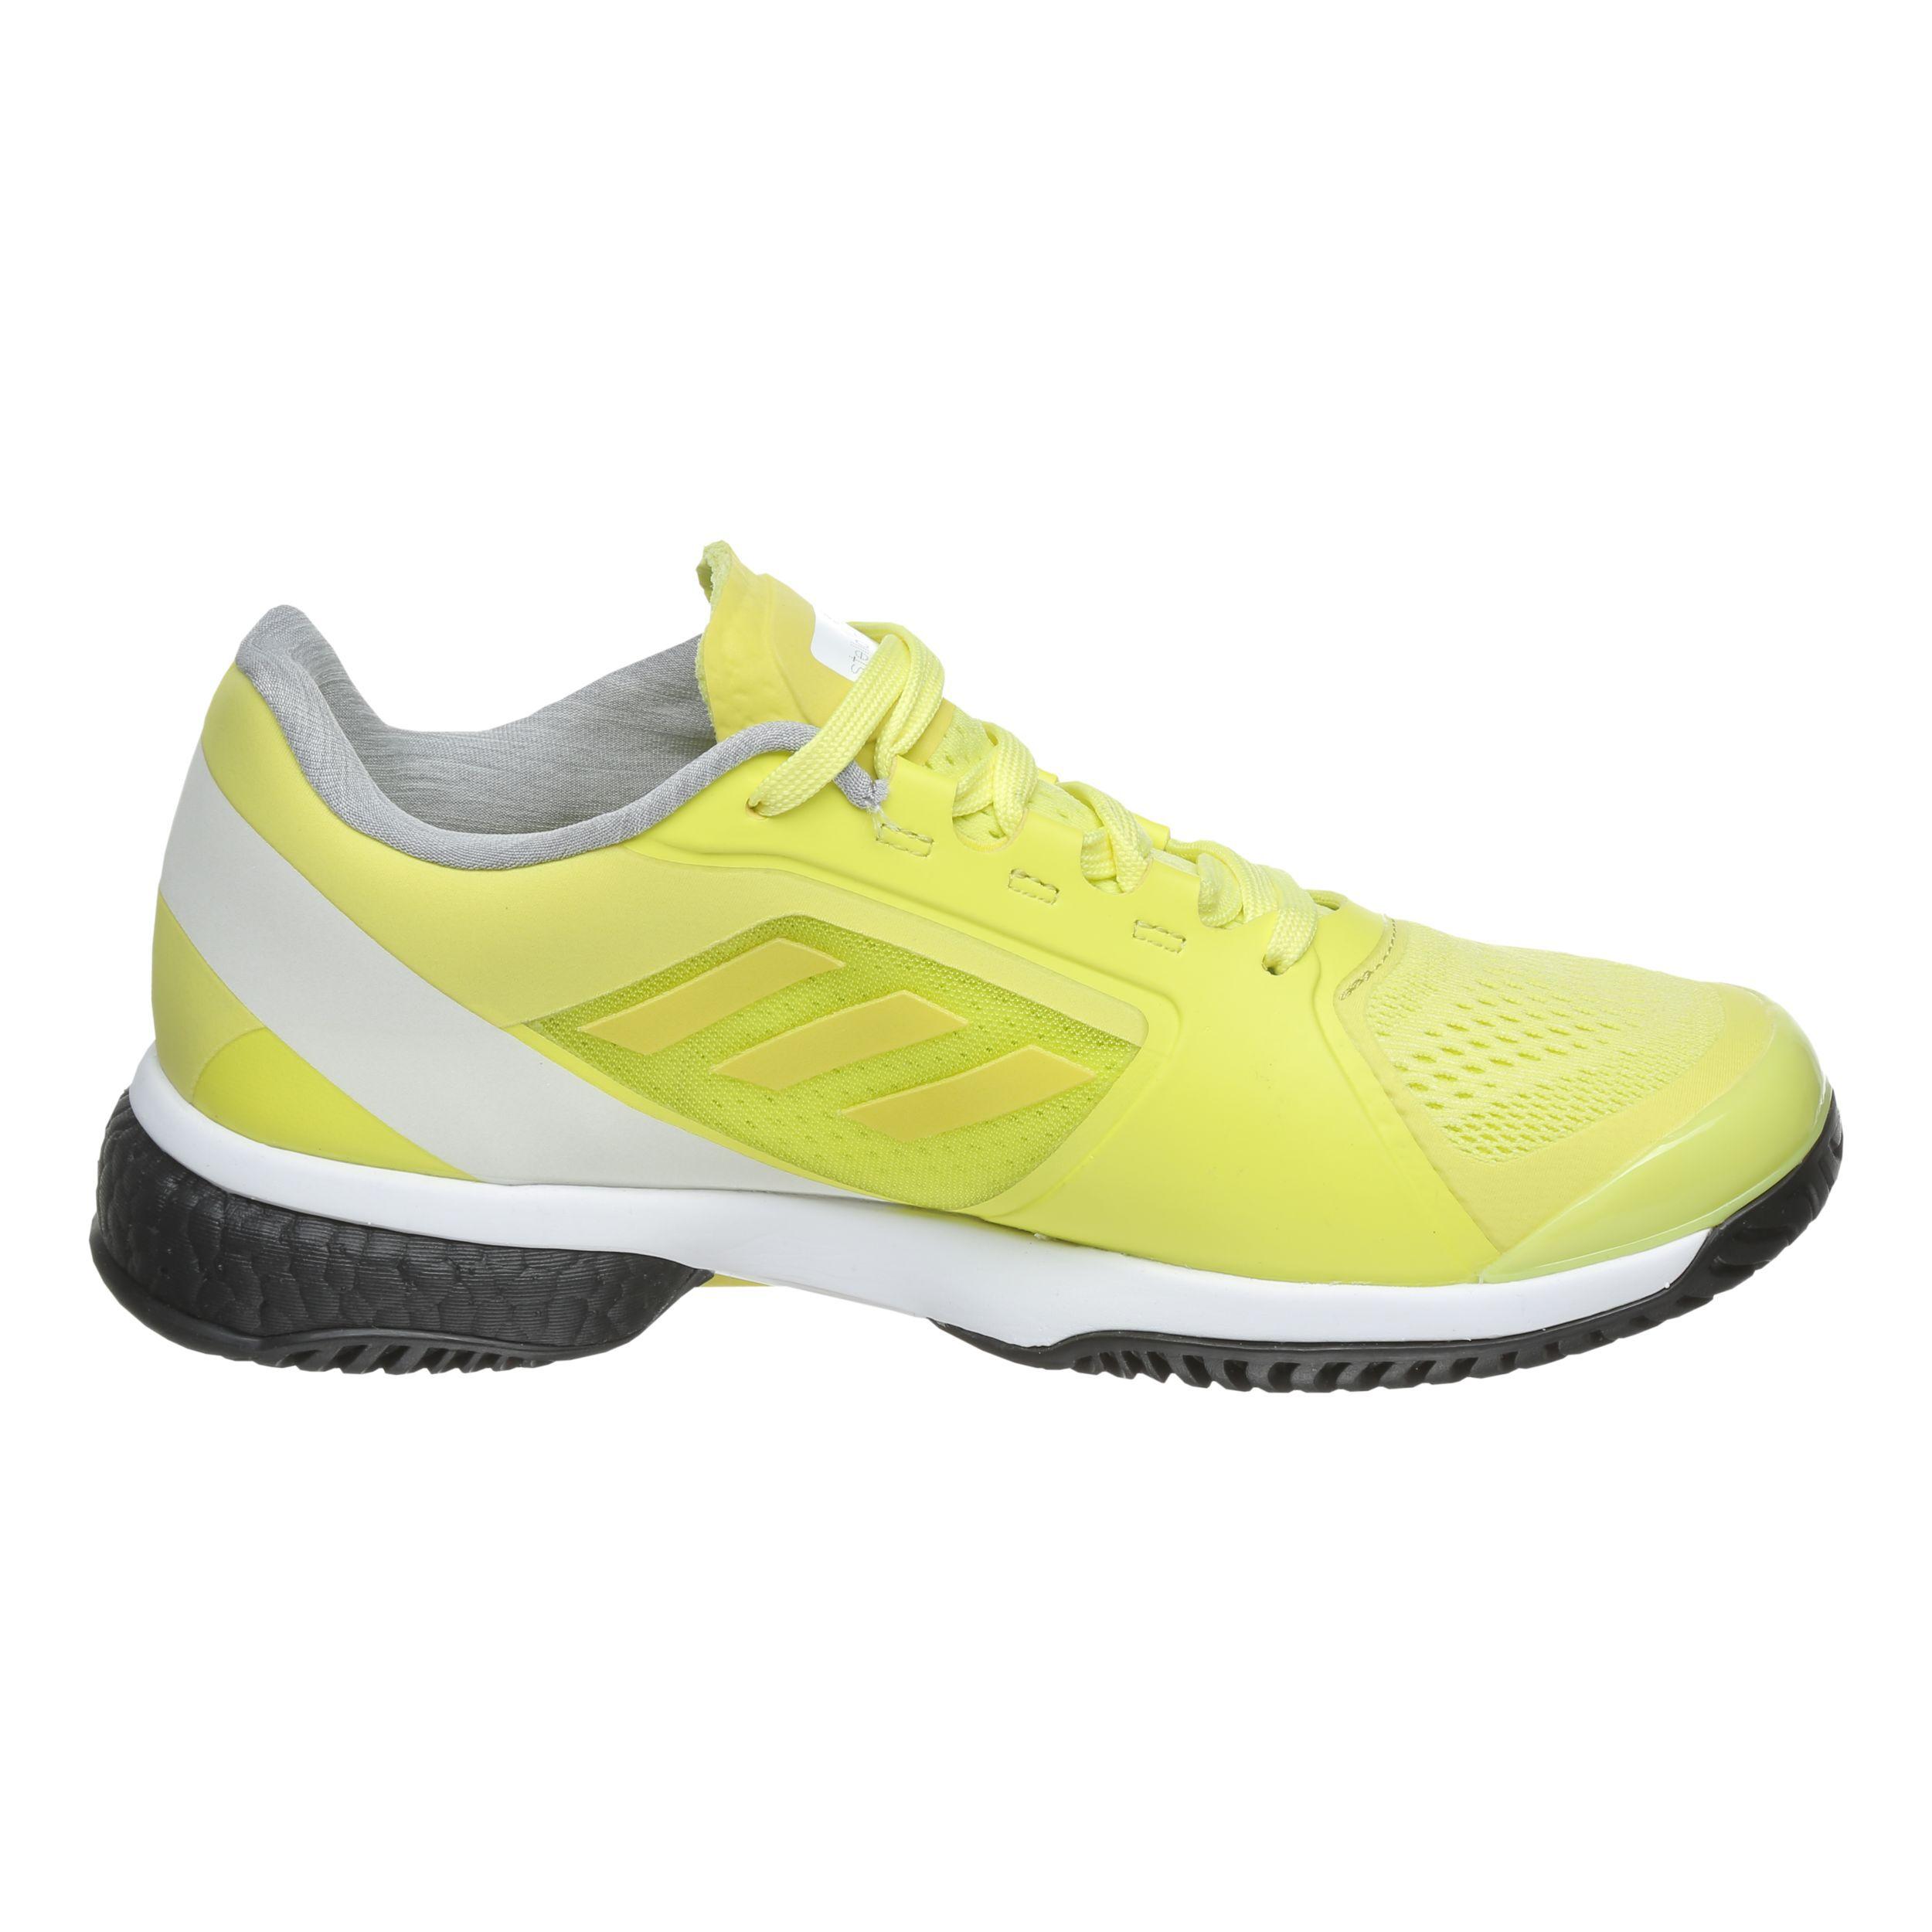 adidas Stella Mccartney Barricade Boost Tennis Sneakers